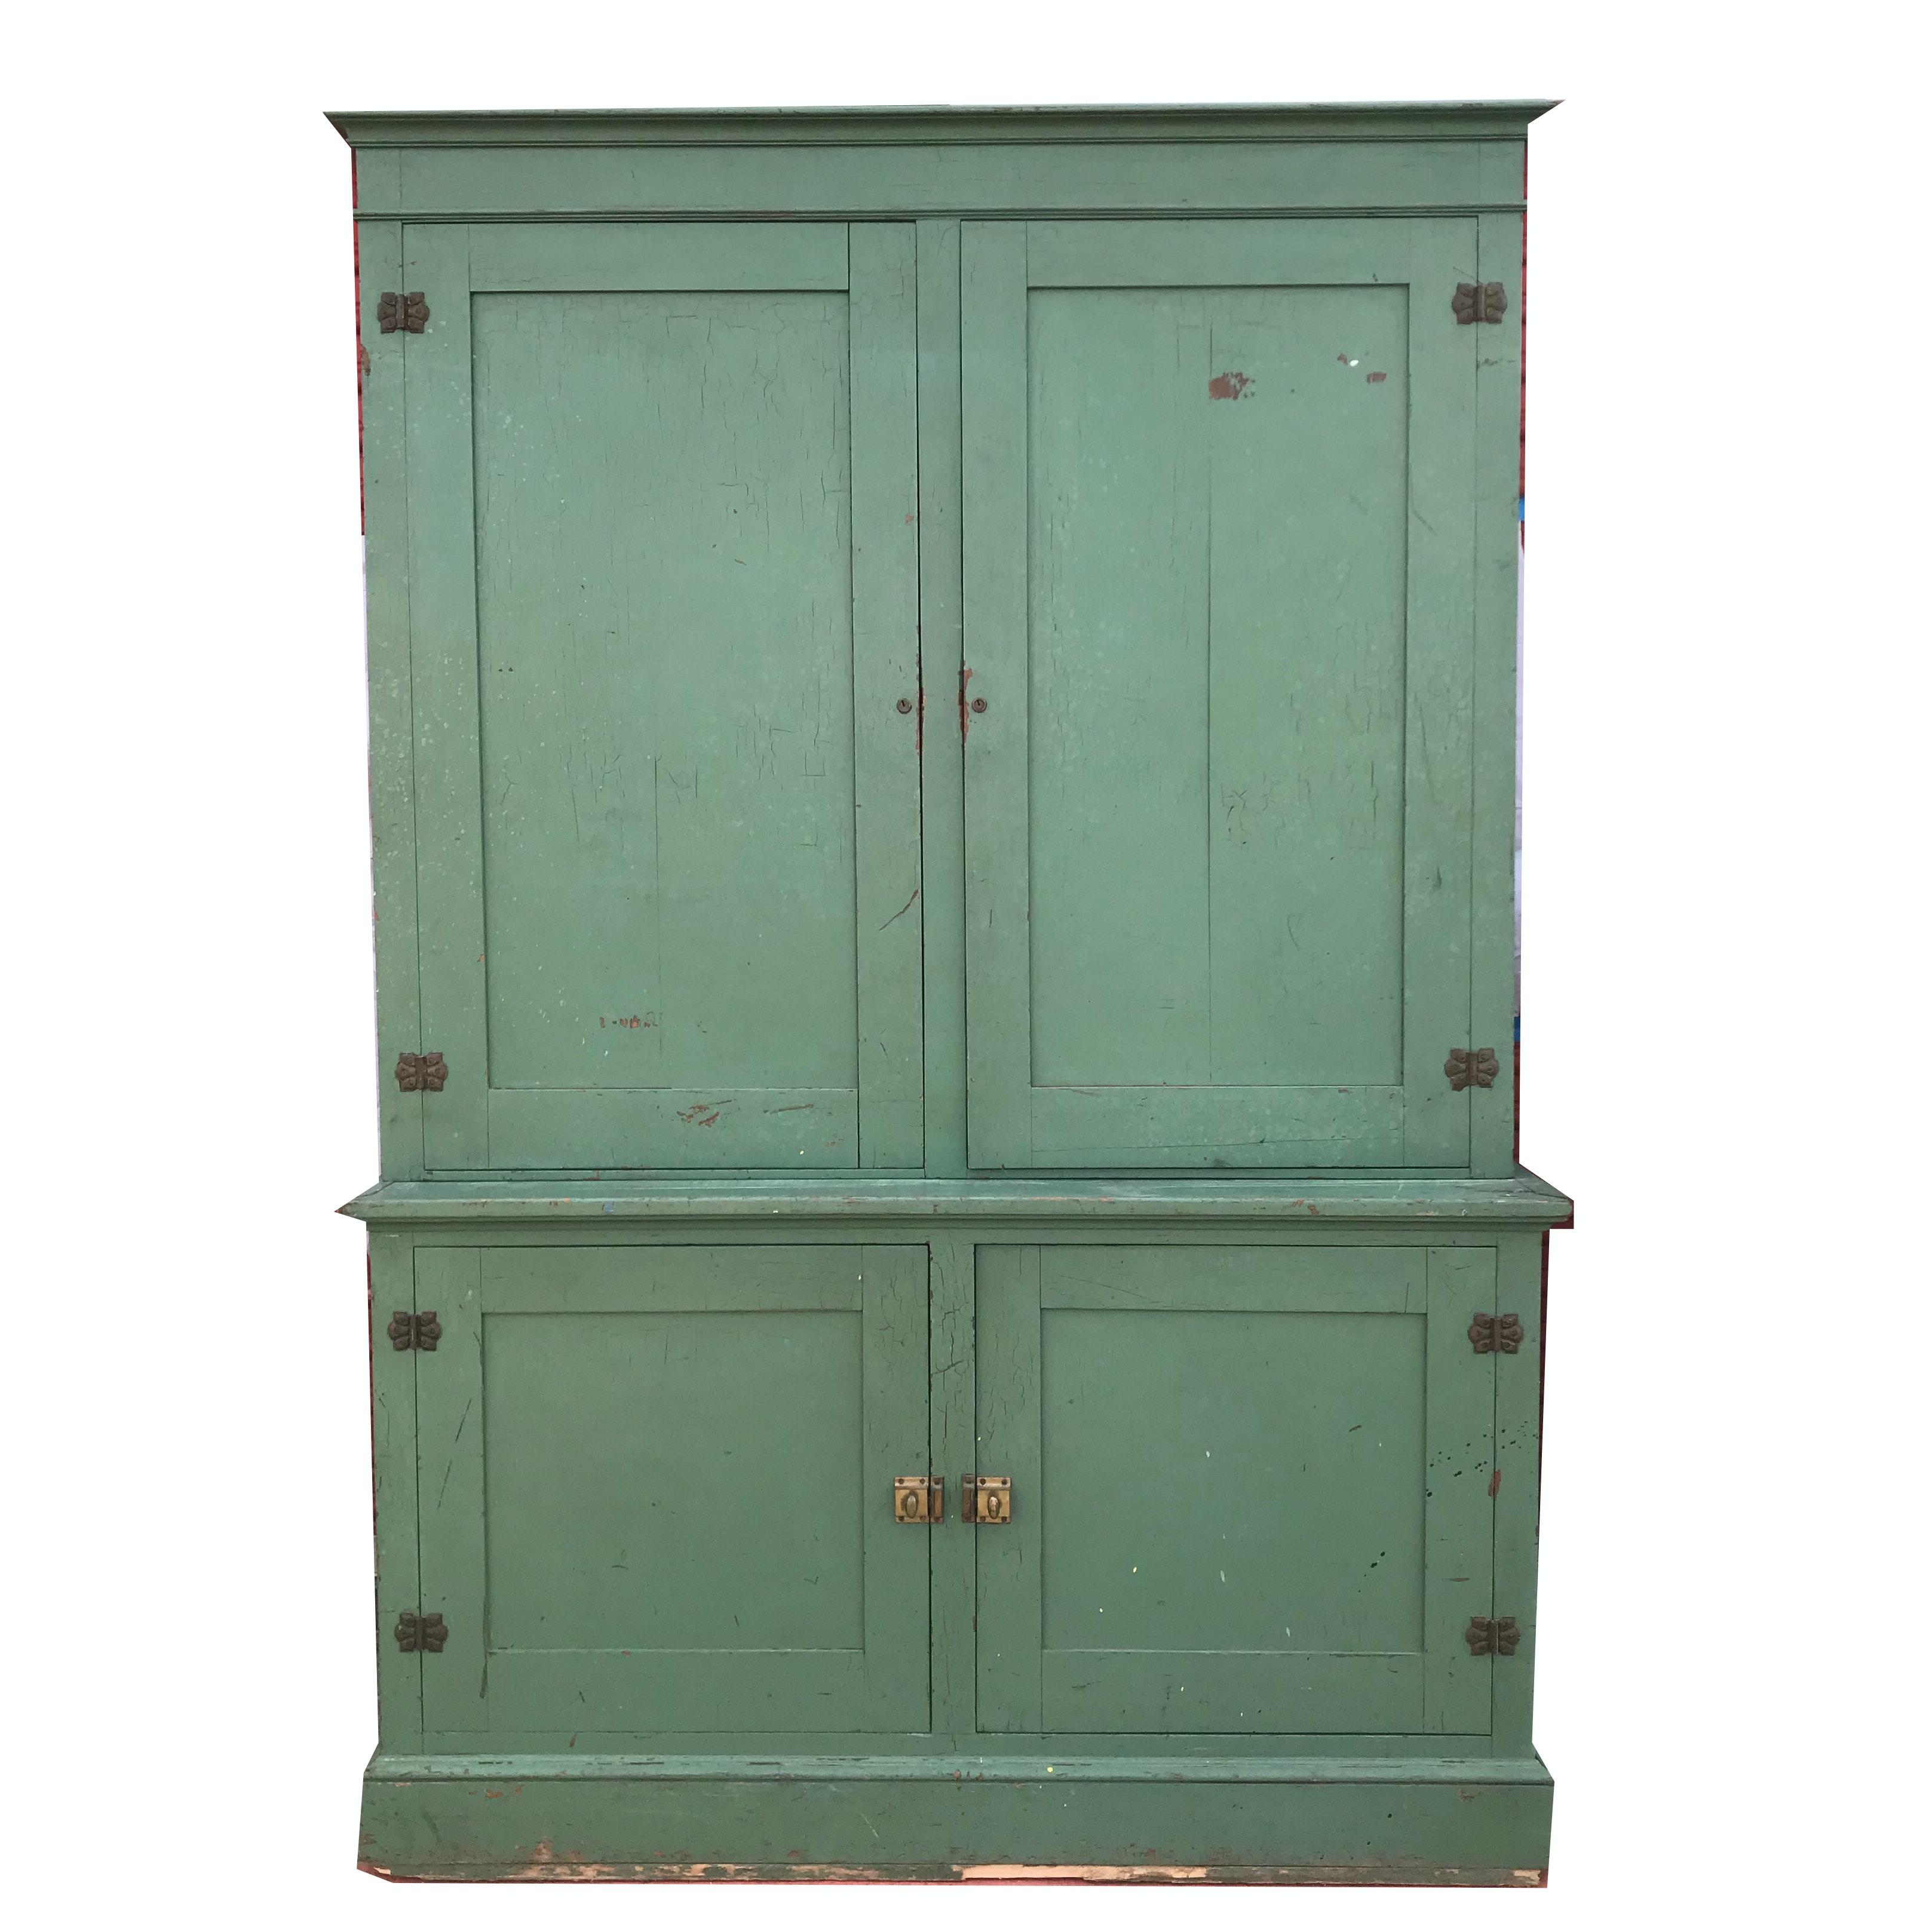 Antique Painted School Locker